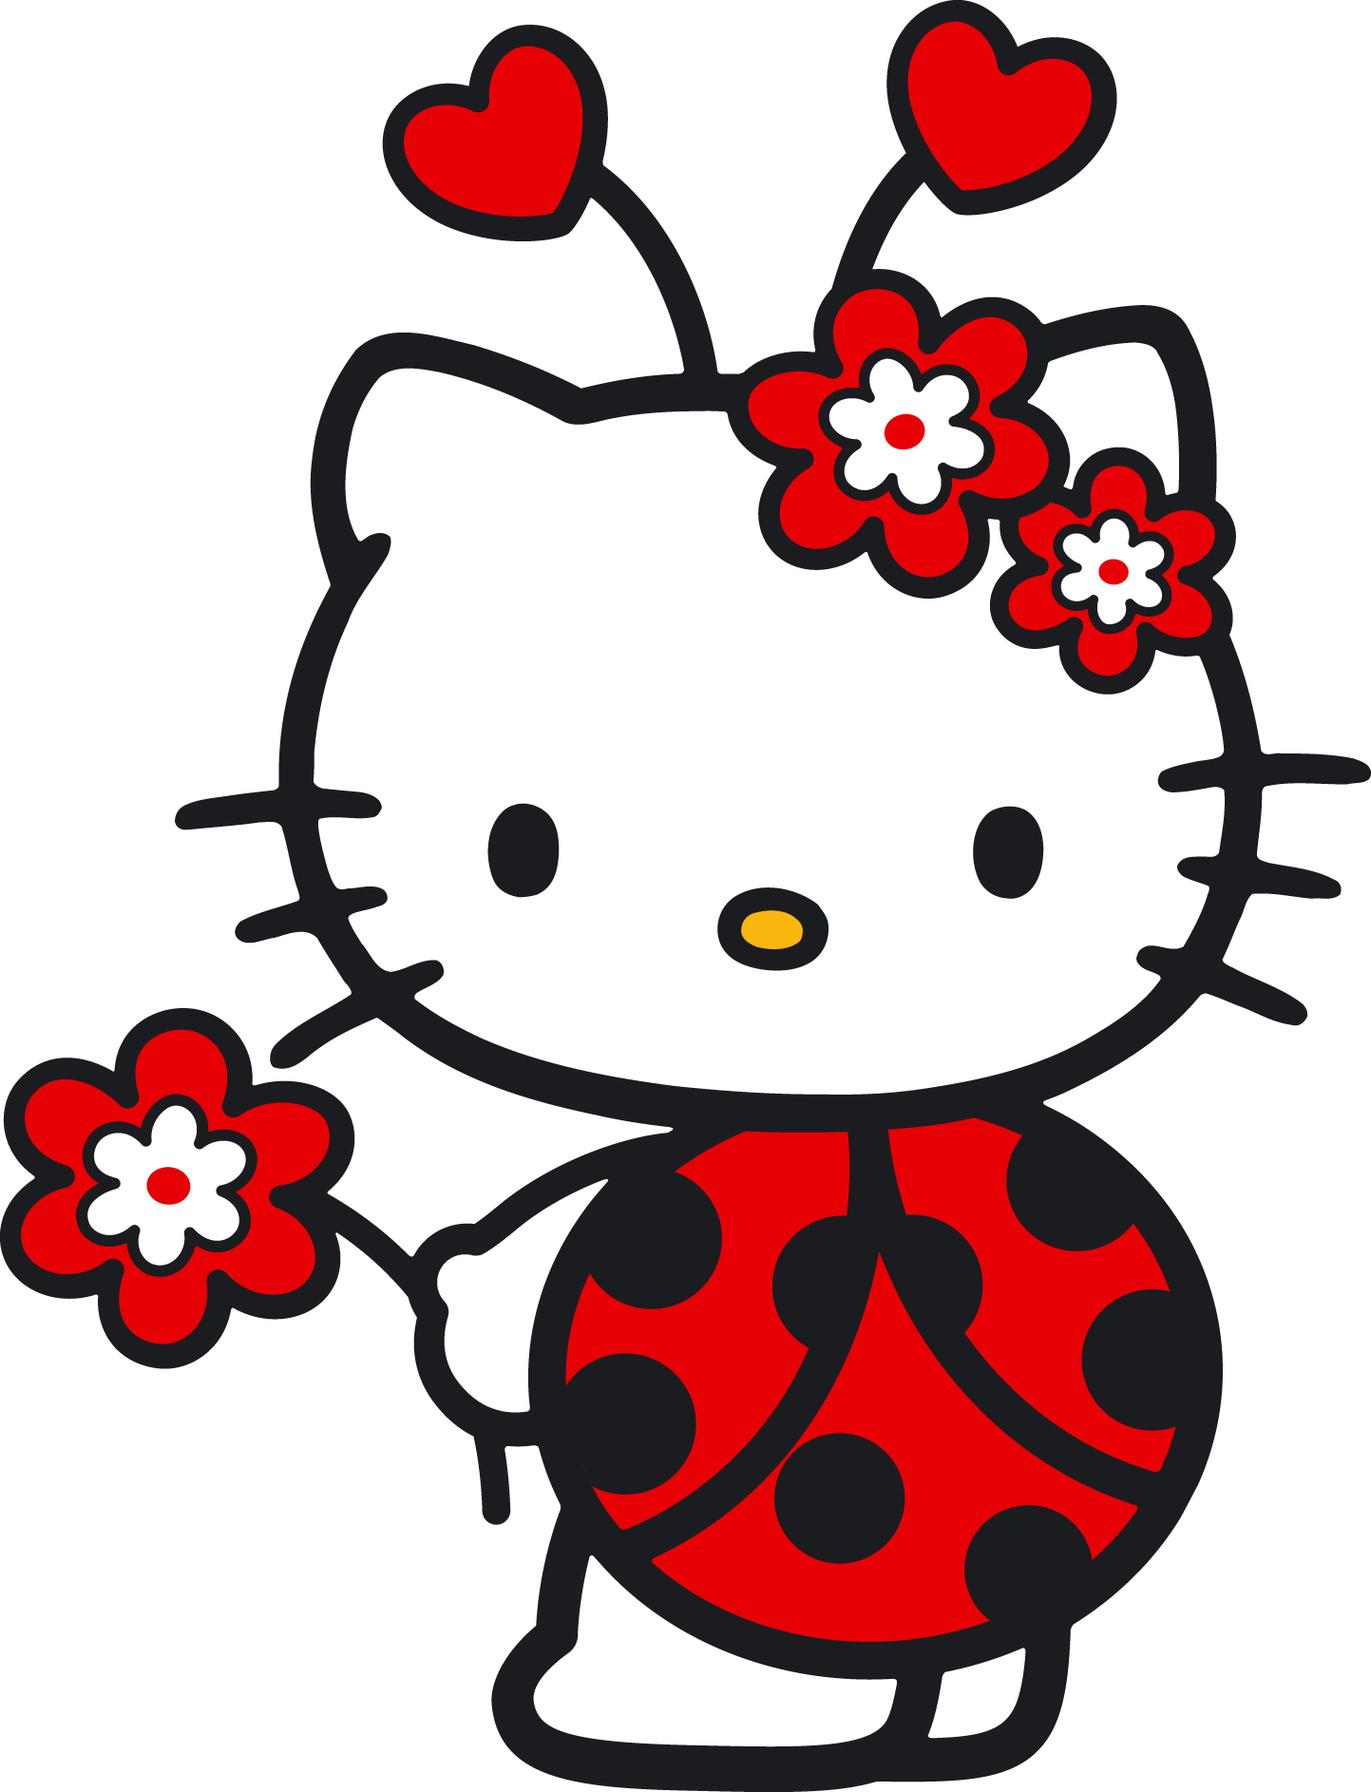 Mask clipart hello kitty Kitty WikiClipArt art Hello to